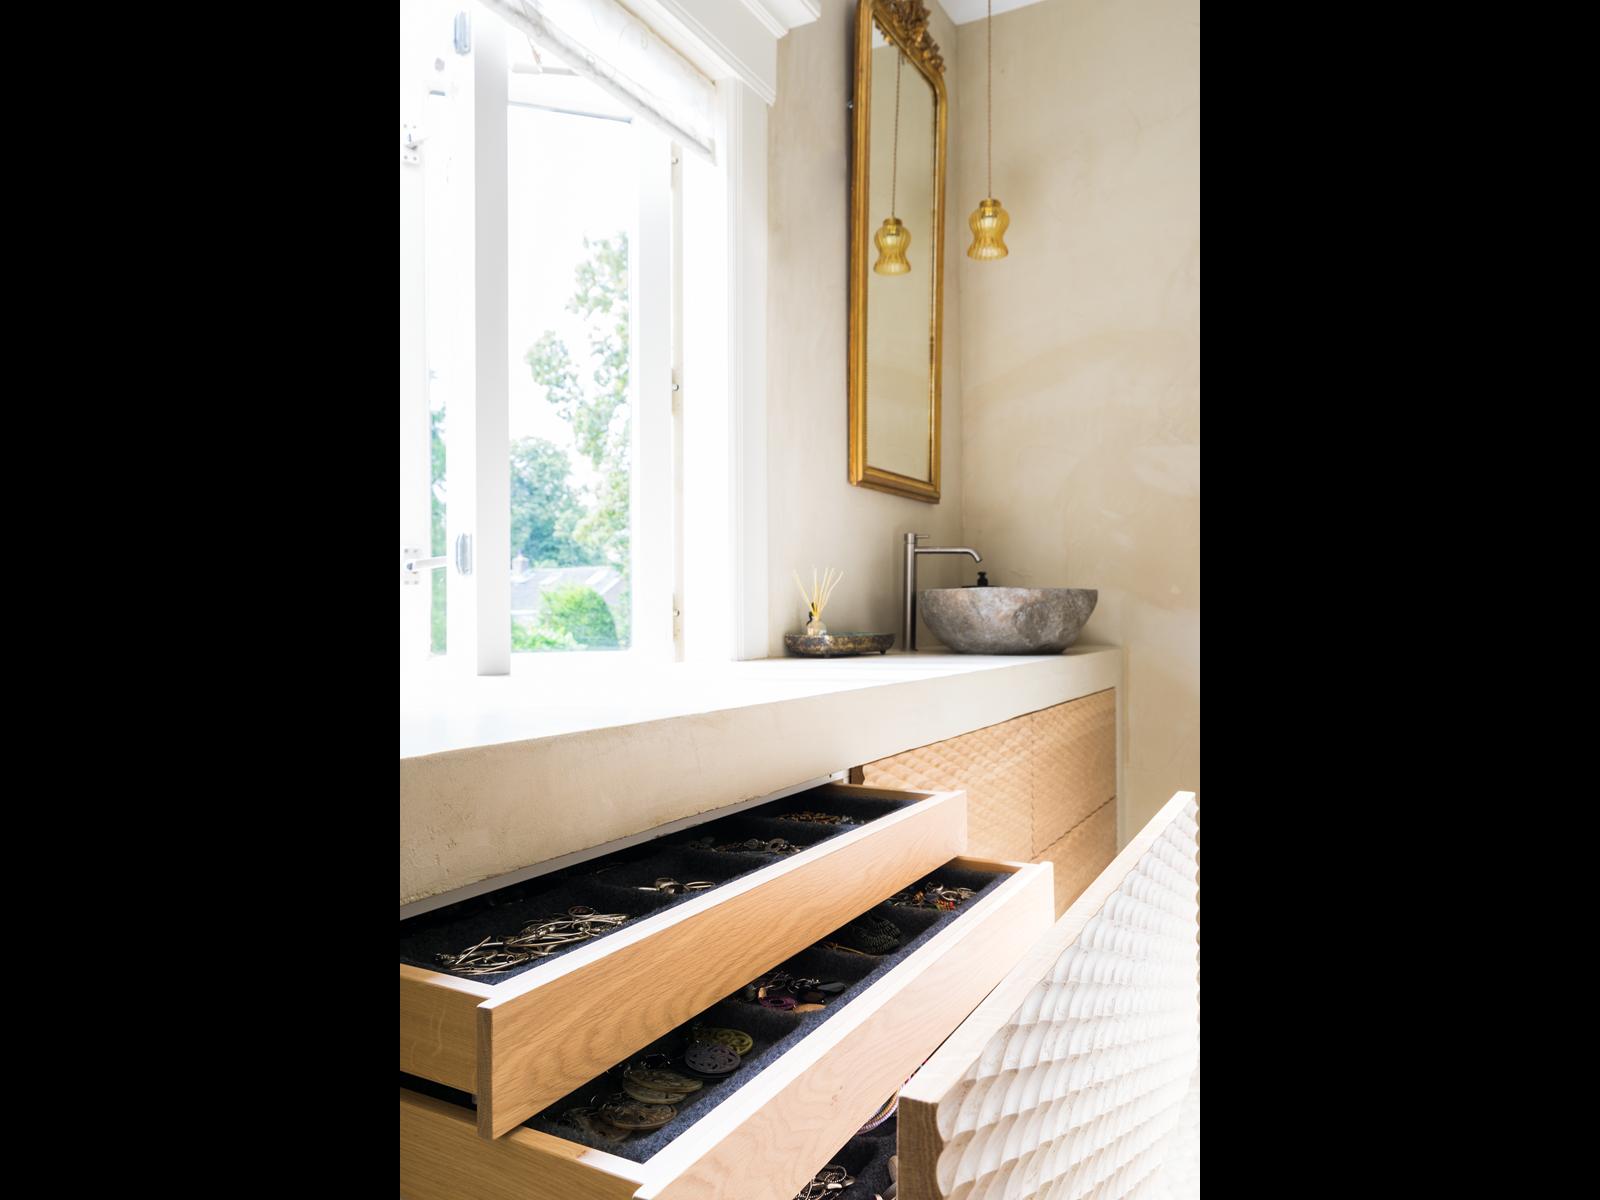 Ibiza stijl badkamer interieurs - \'t Kroonhuys